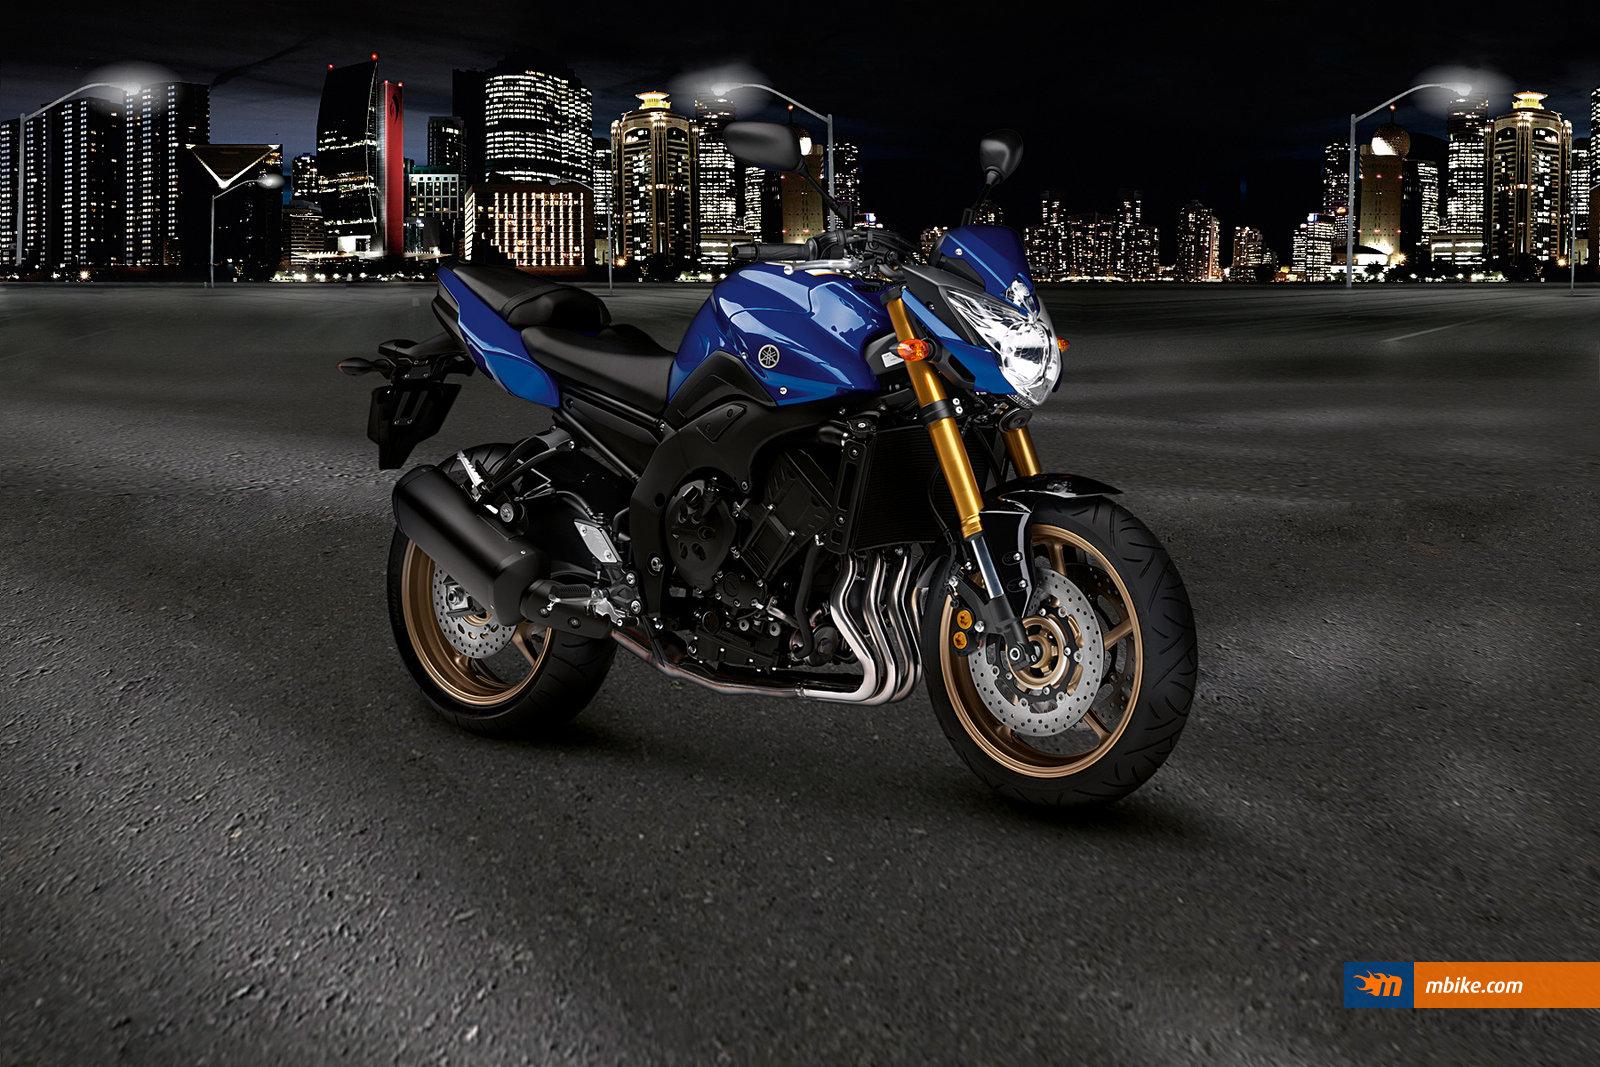 2010 Yamaha FZ8 FZ8N Wallpaper   Mbikecom 1600x1067